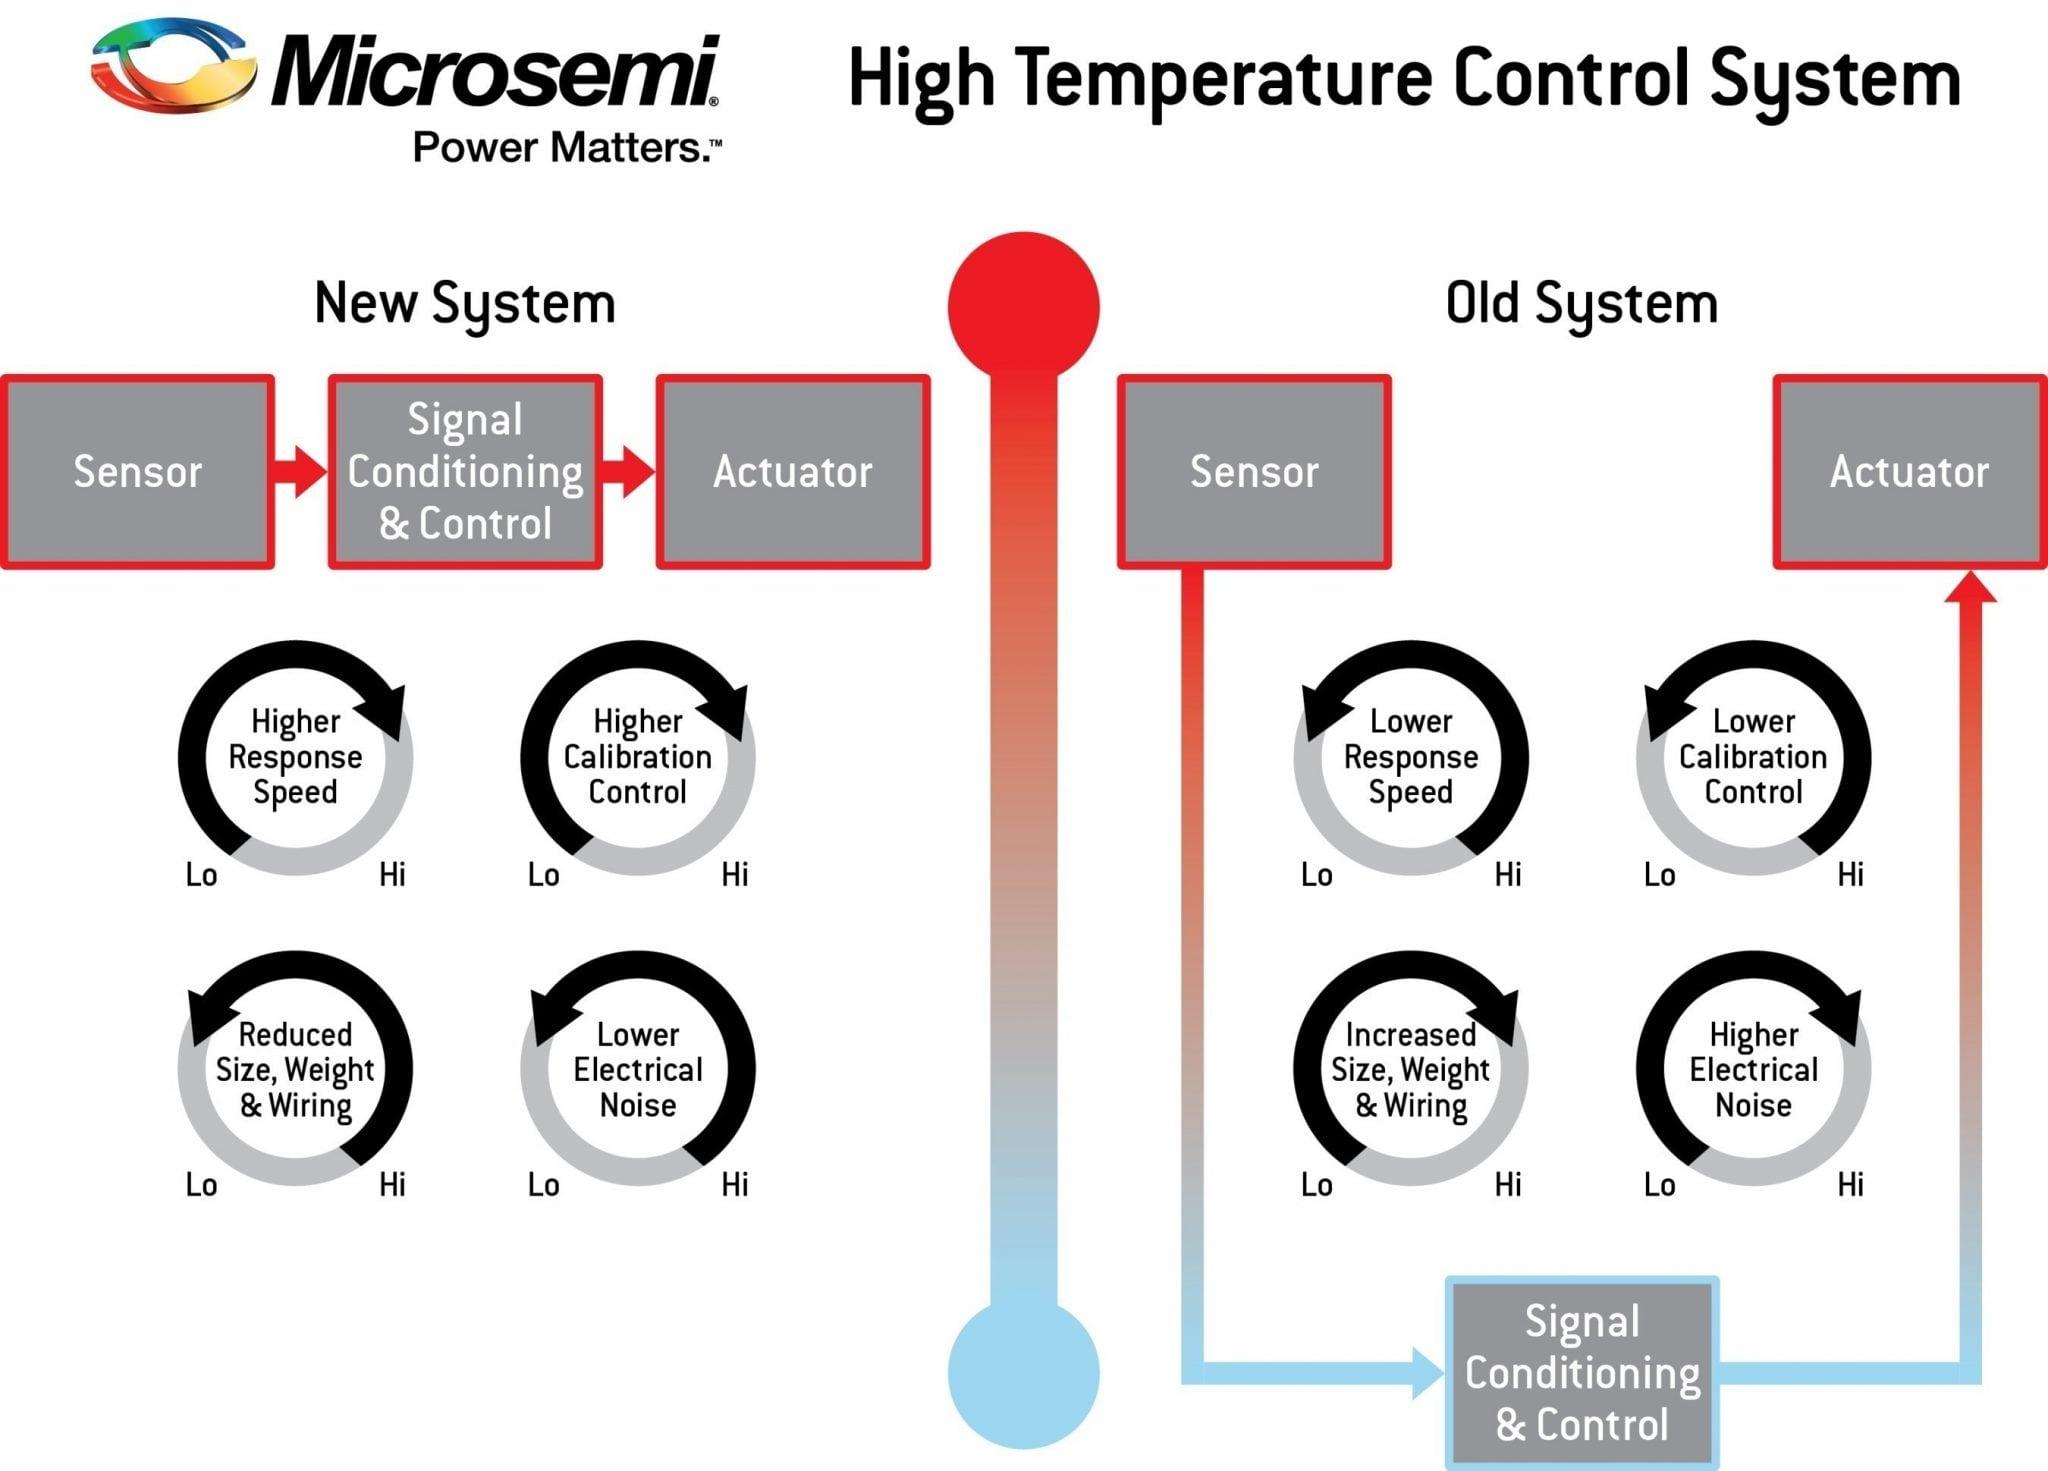 A diagram of Microsemi's high temperature control system plan for avionics actuators